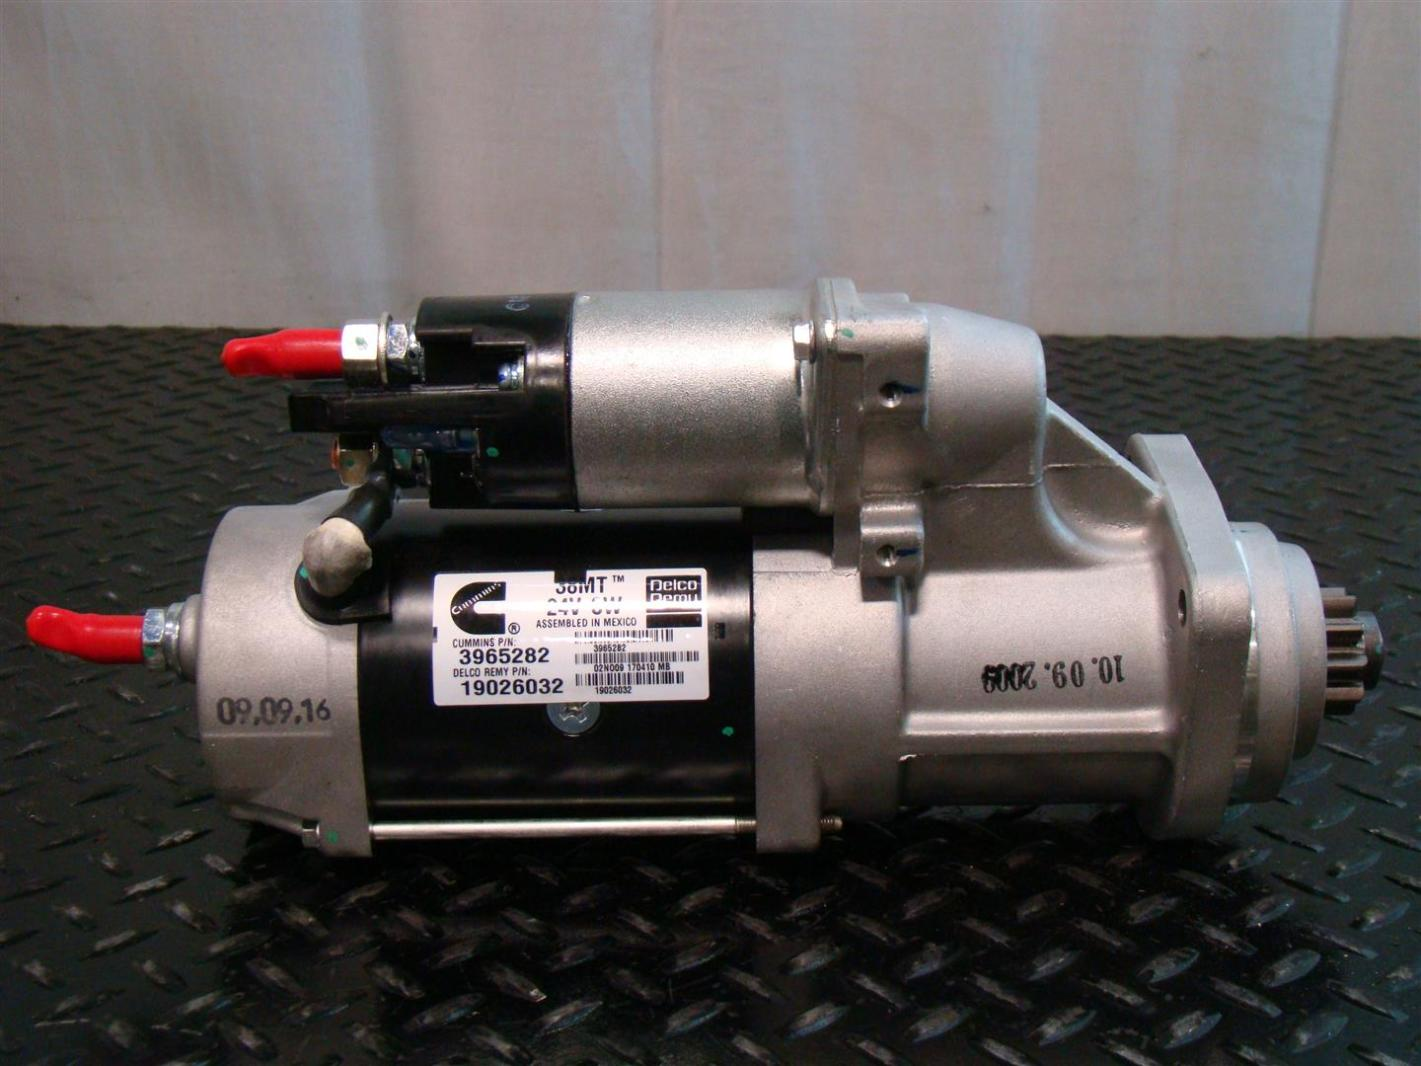 39mt Wiring Remy Diagrams Delco 8200483 Basics Fuel Pump Relay Alternator Diagram 38mt Starter Trusted Rh Kroud Co Cs130 3 Wire